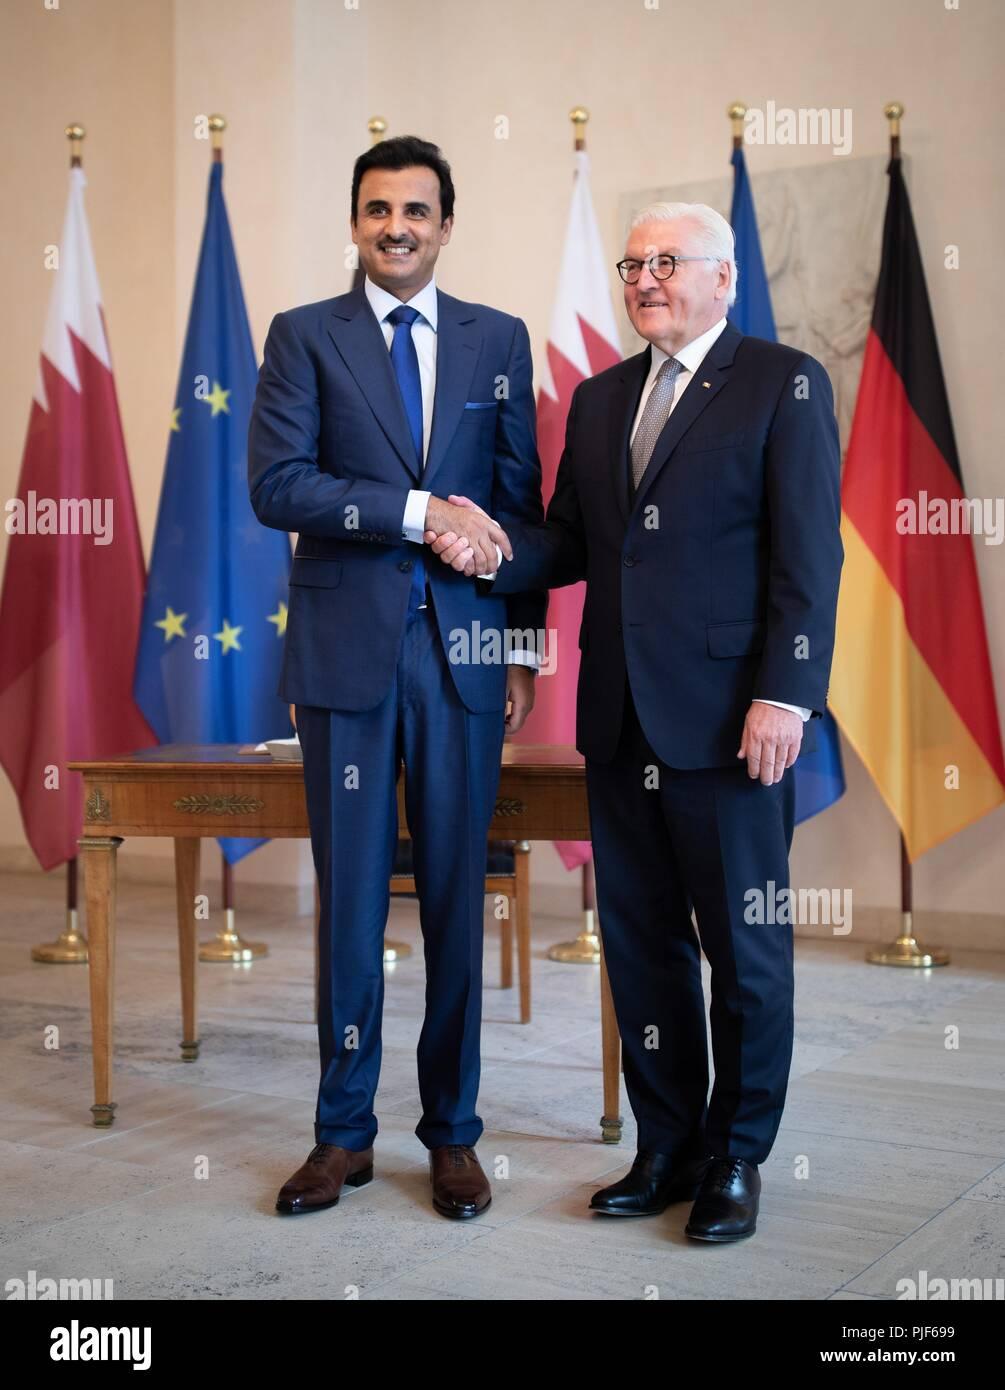 Berlin, Germany. 07th Sep, 2018. 07.09.2018, Berlin: Federal President Frank-Walter Steinmeier (r) receives the Emir of Qatar, Sheikh Tamim bin Hamad Al-Thani, at Bellevue Castle. Credit: Kay Nietfeld/dpa/Alamy Live News - Stock Image